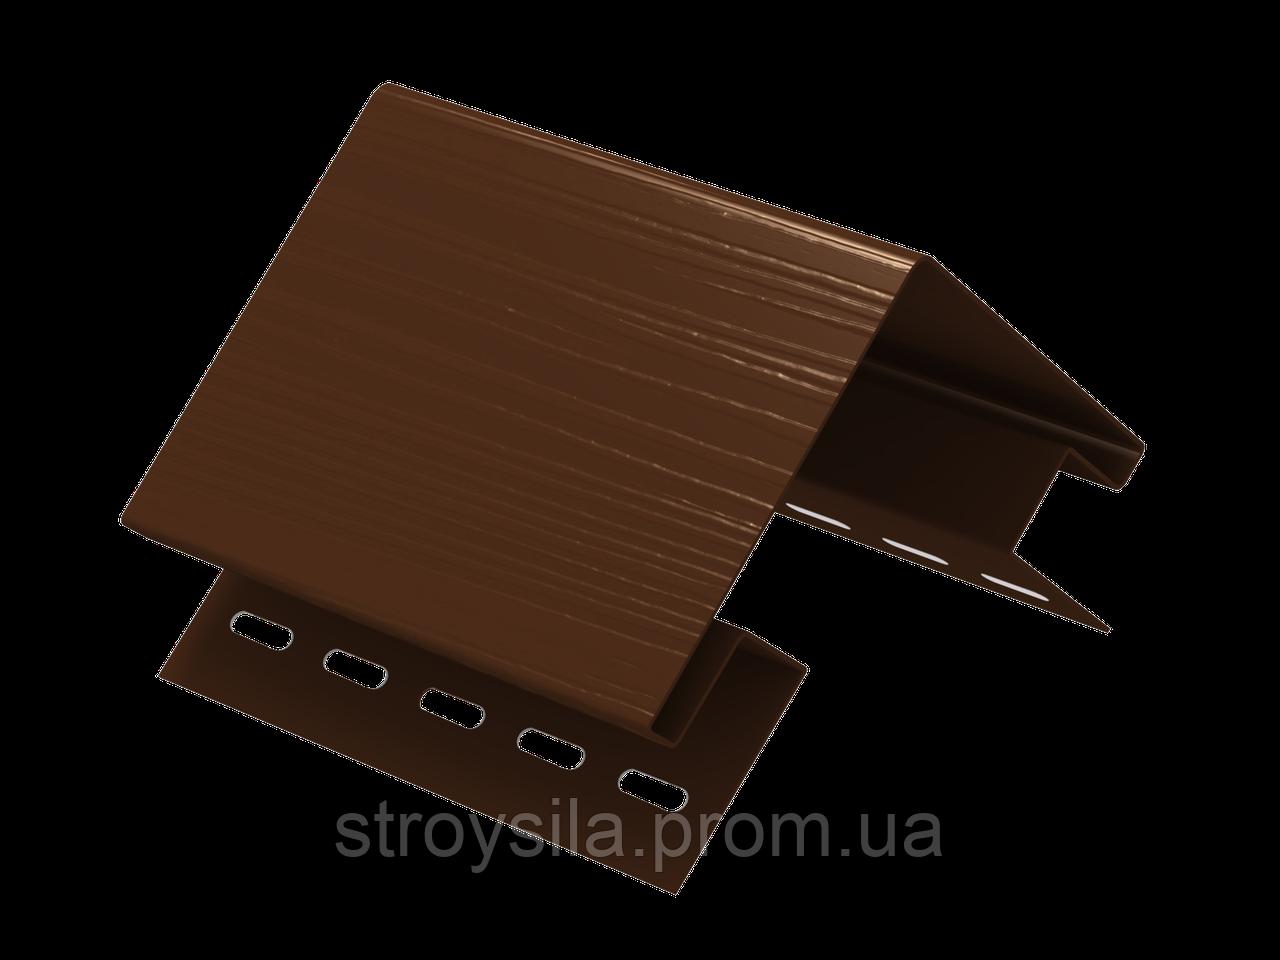 Наружный угол ″Ю-Пласт″ коричневый 3,05м